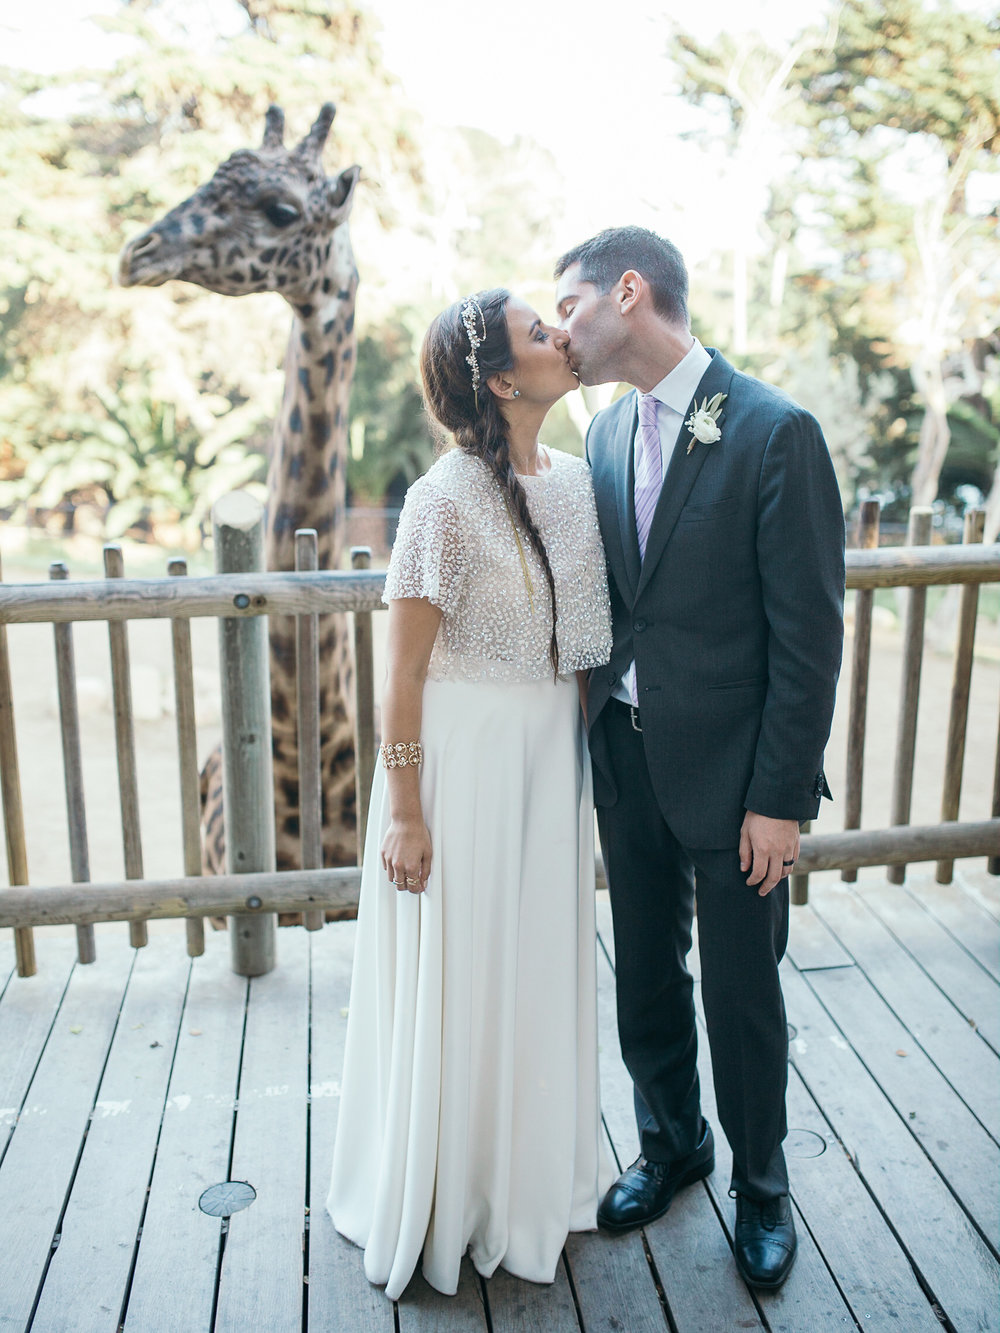 www.santabarbarawedding.com | Kiel Rucker | Santa Barbara Zoo |